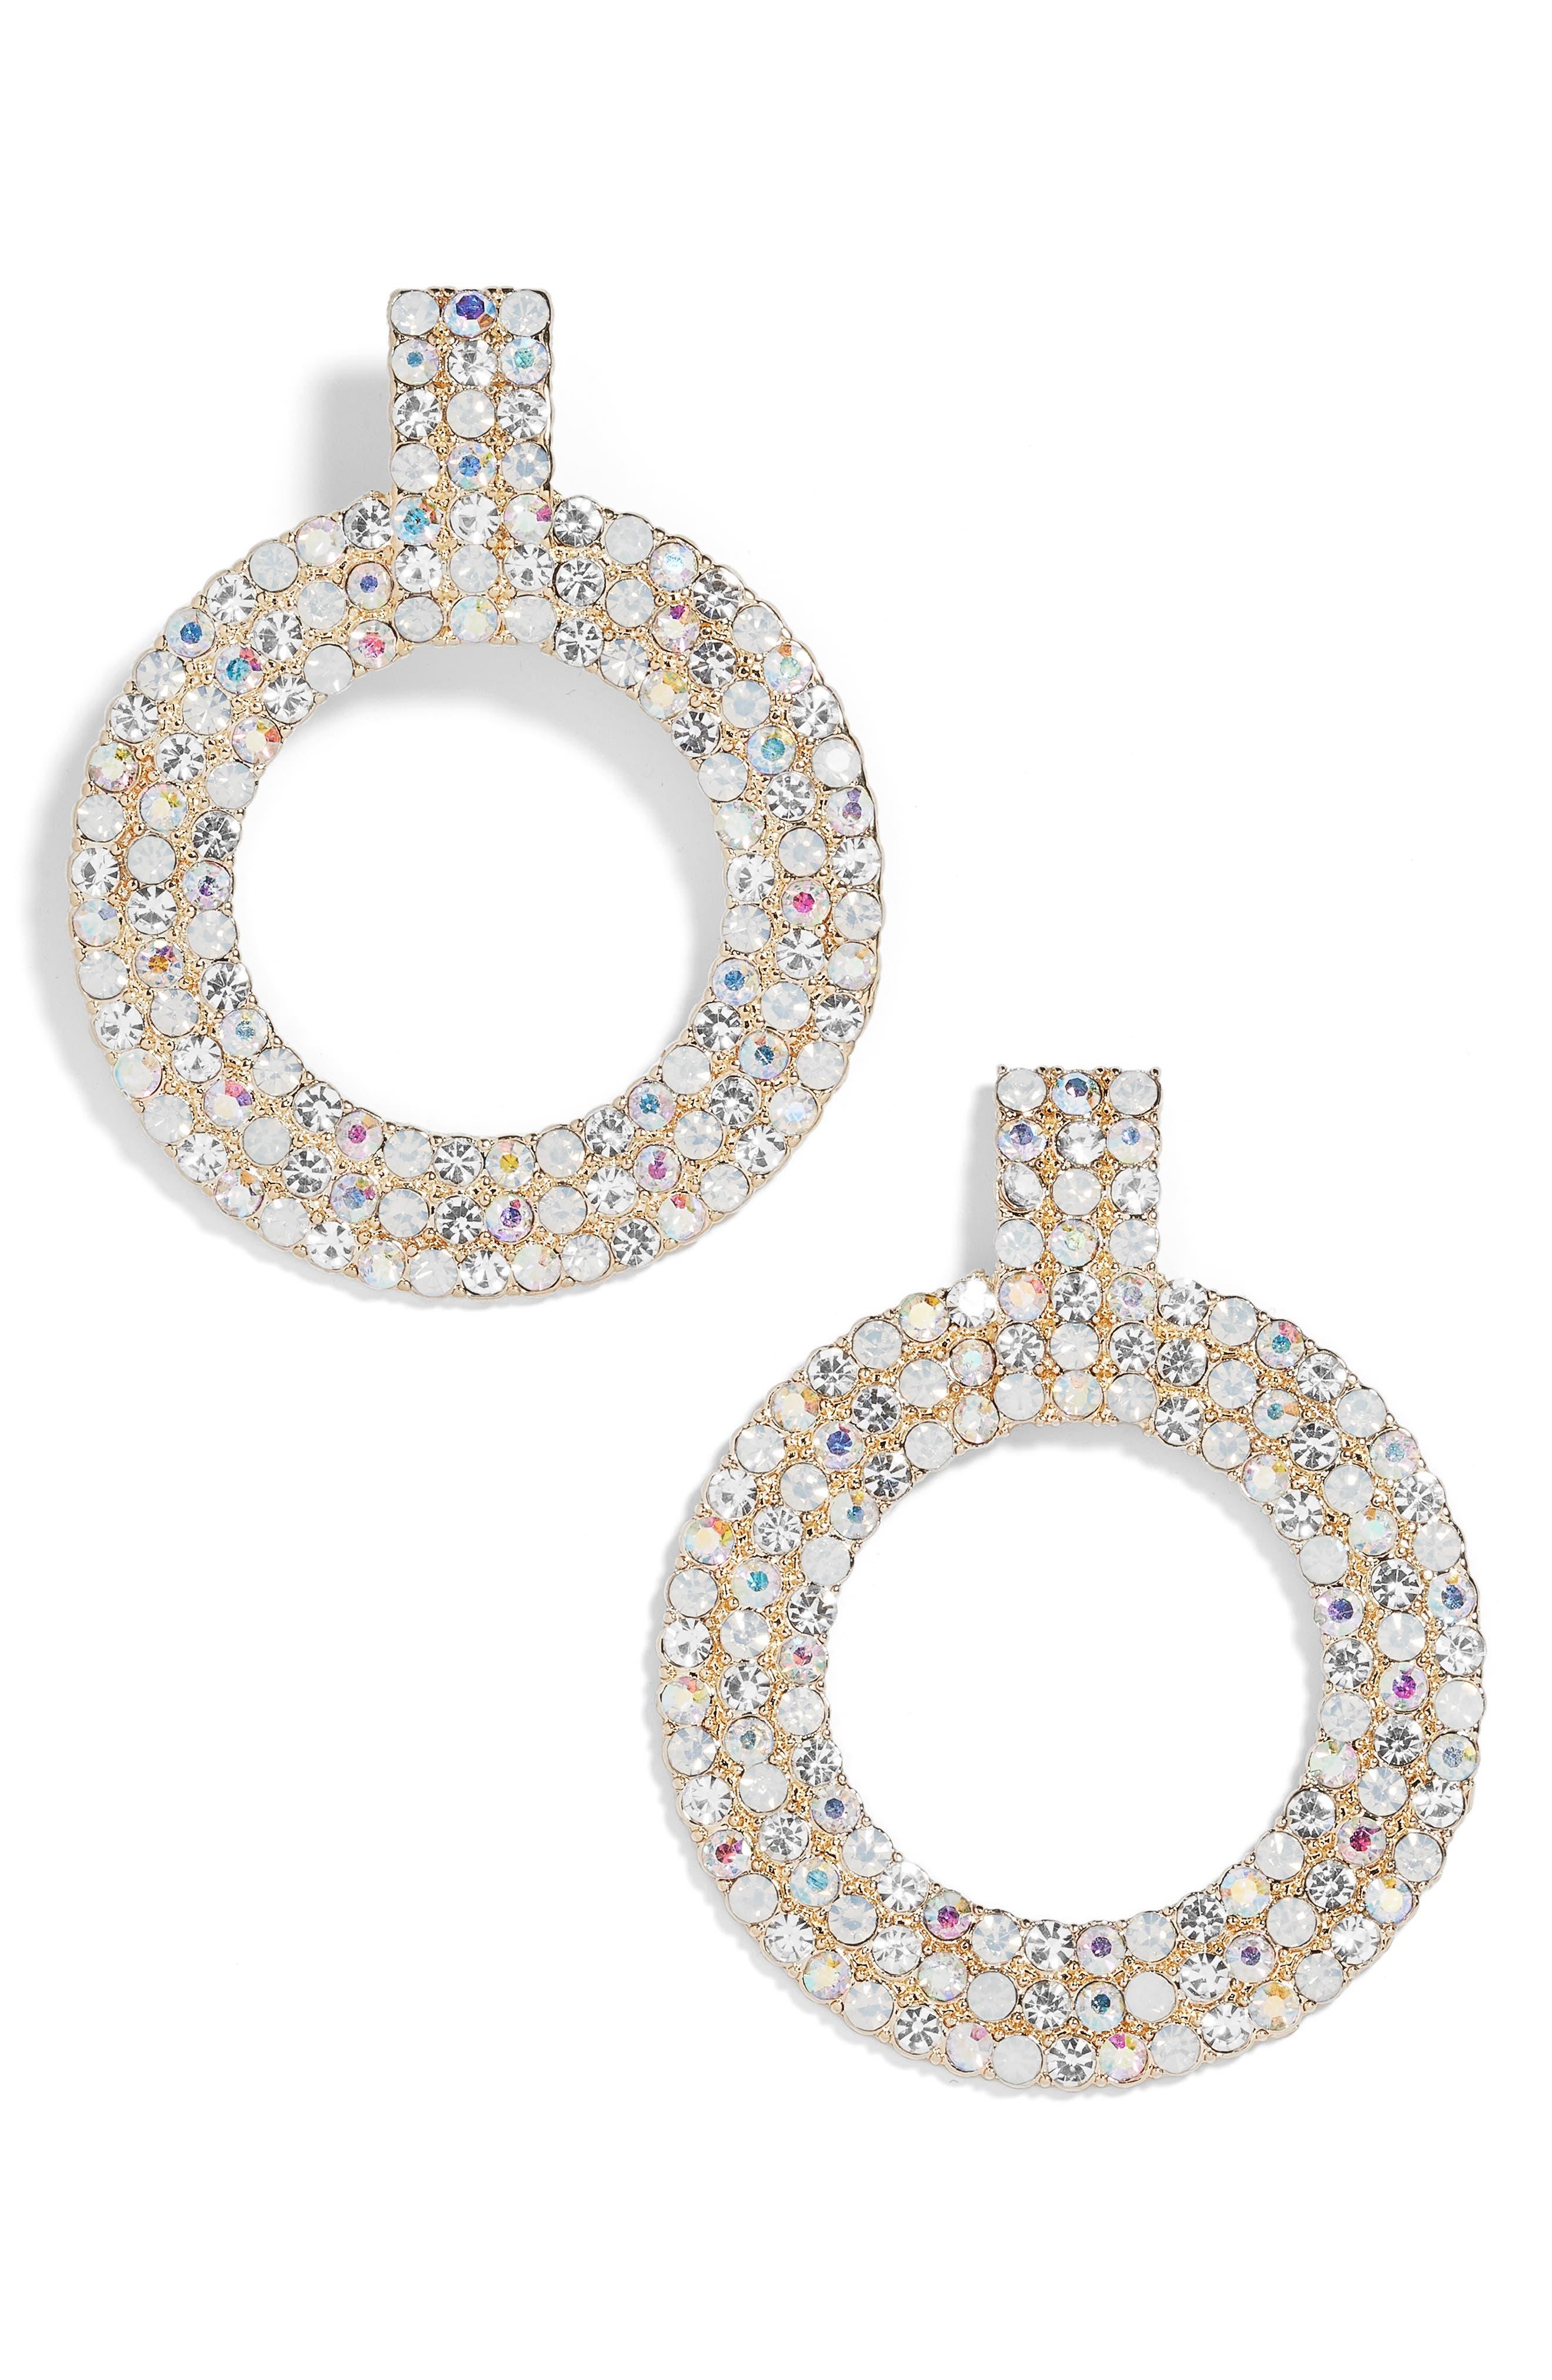 Adonia Pavé Hoop Earrings,                         Main,                         color, CLEAR/ OPAL